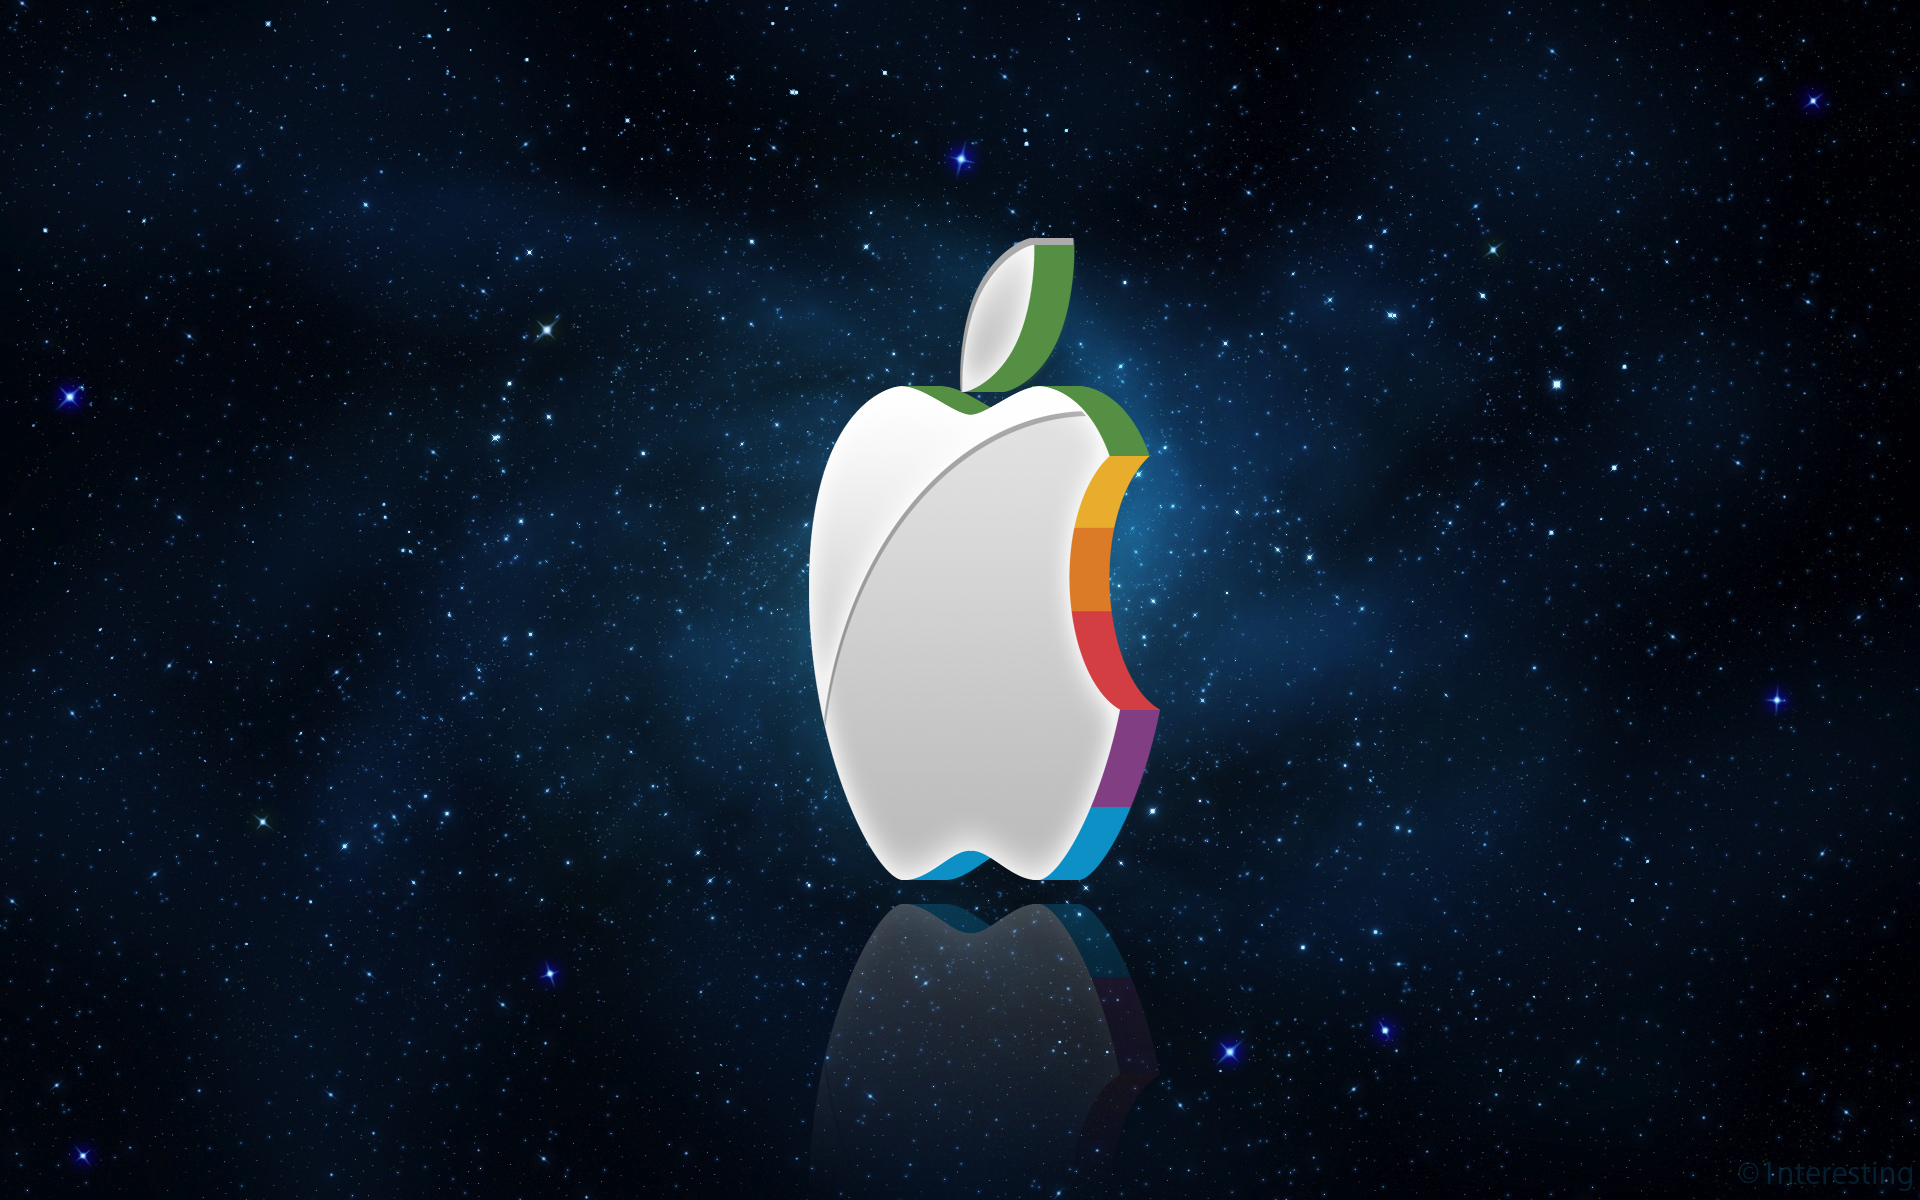 3D Apple Logo Wallpaper by 1nteresting